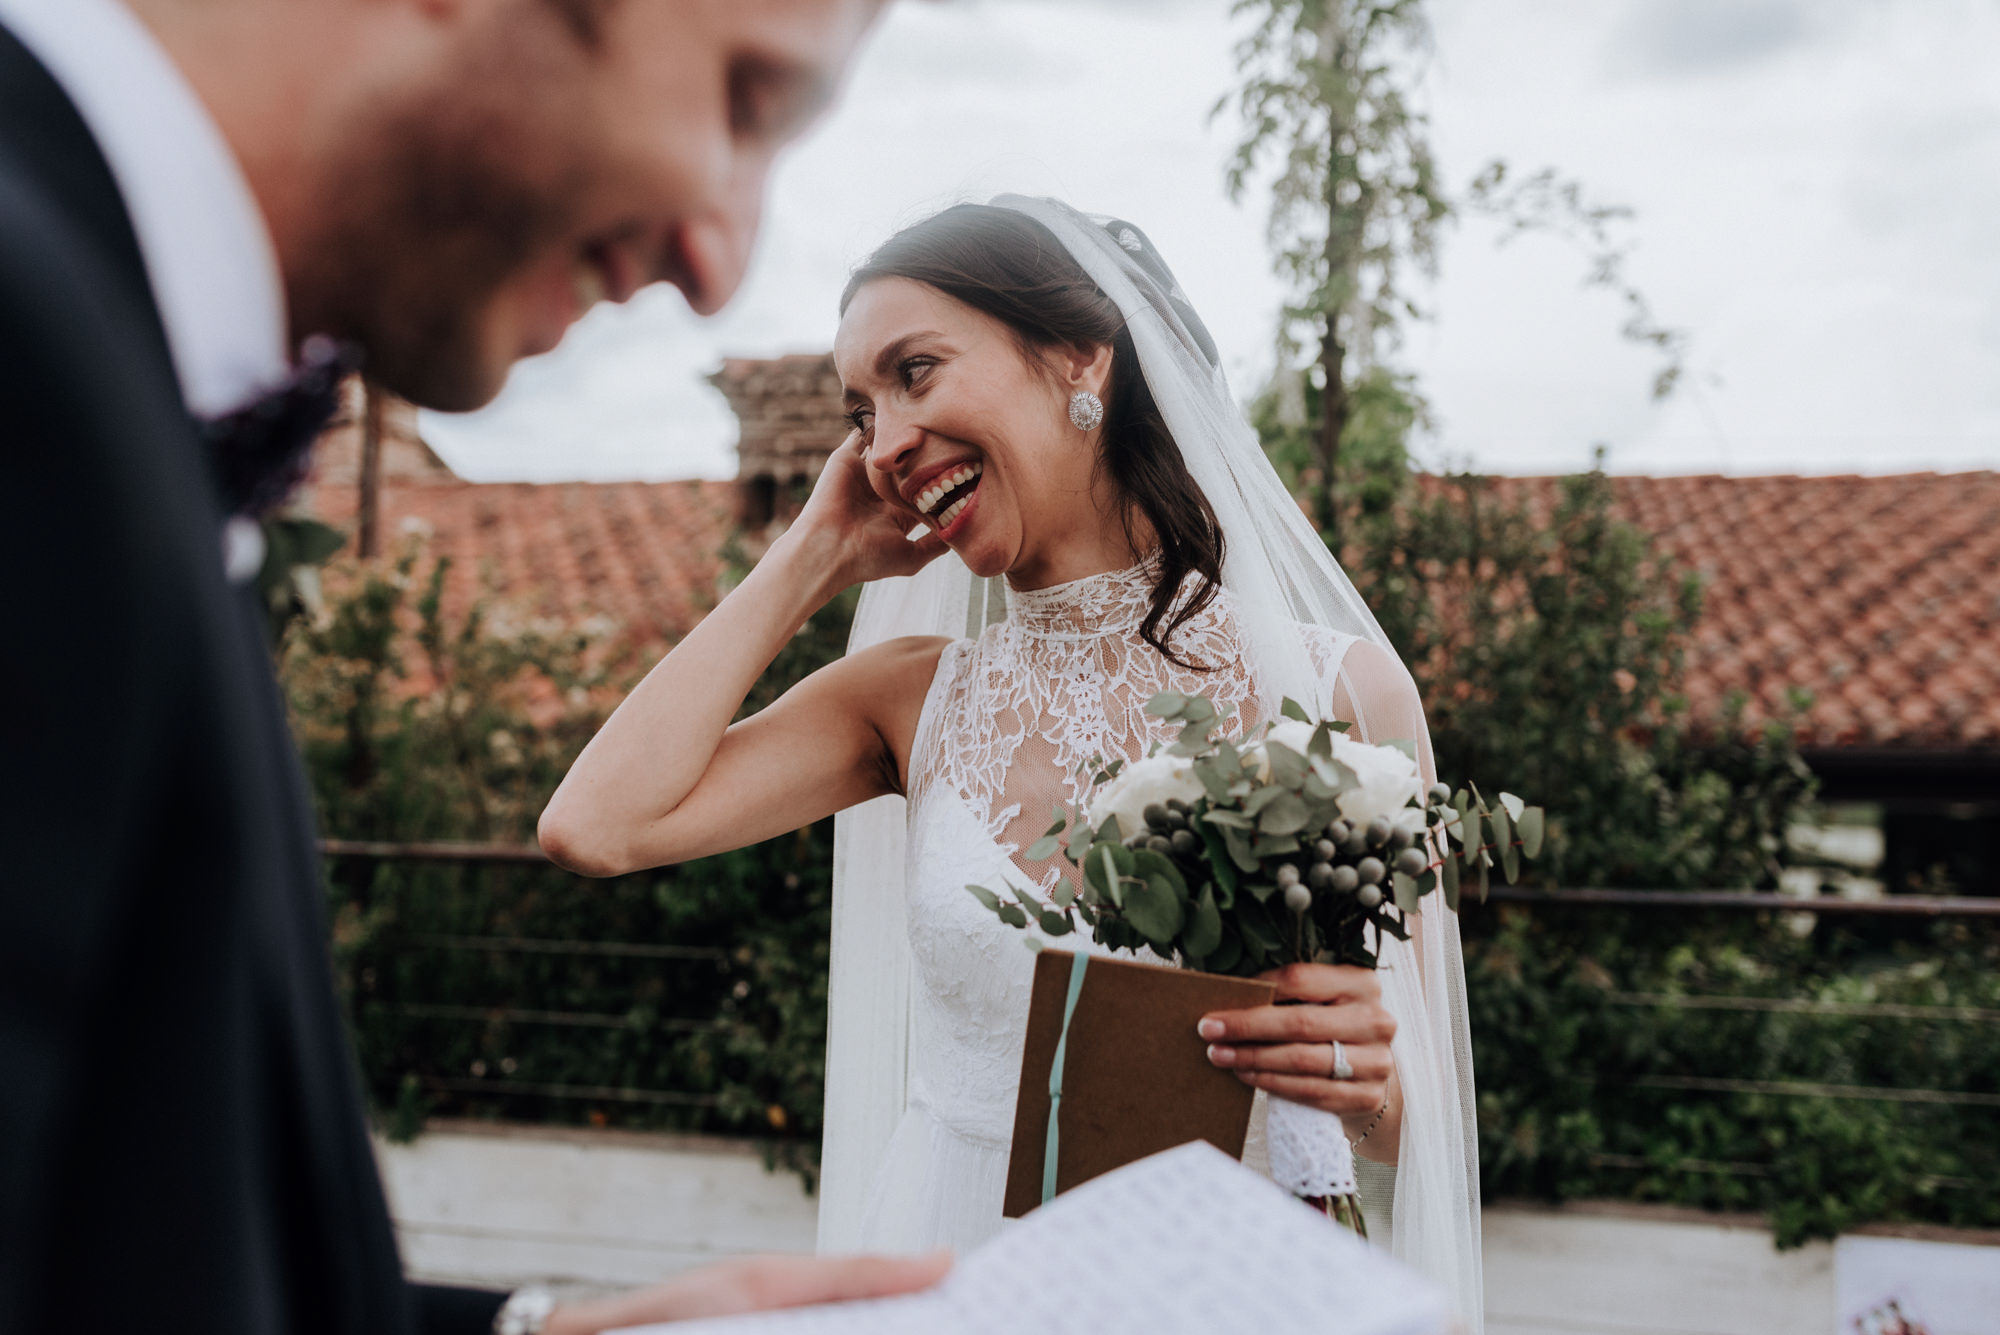 FOTO+PHOTO+BODA+WEDDING+ITALIA+ITALY+MAURICIO+GARAY+MAURICIOGARAY+WEDDINPHOTOGRAPHER+FOTOGRAFODEBODA-1480.jpg